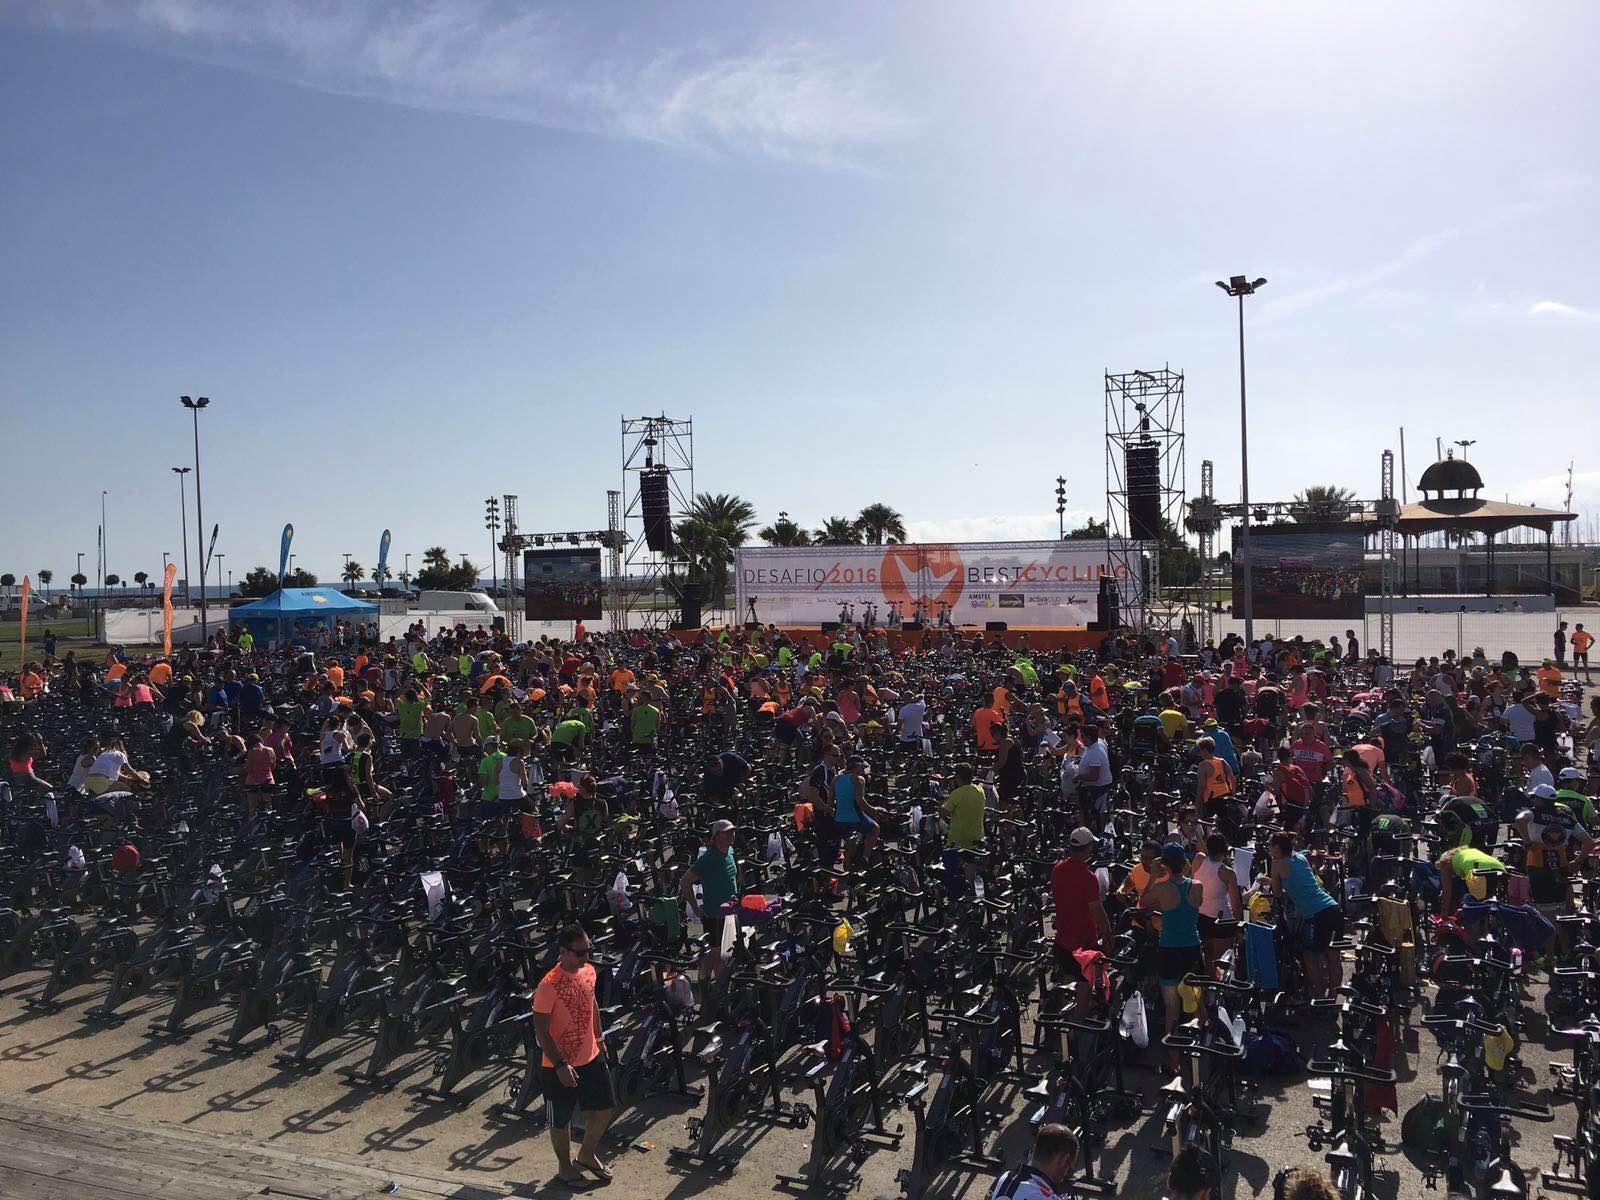 Desafio Best Cycling 2016